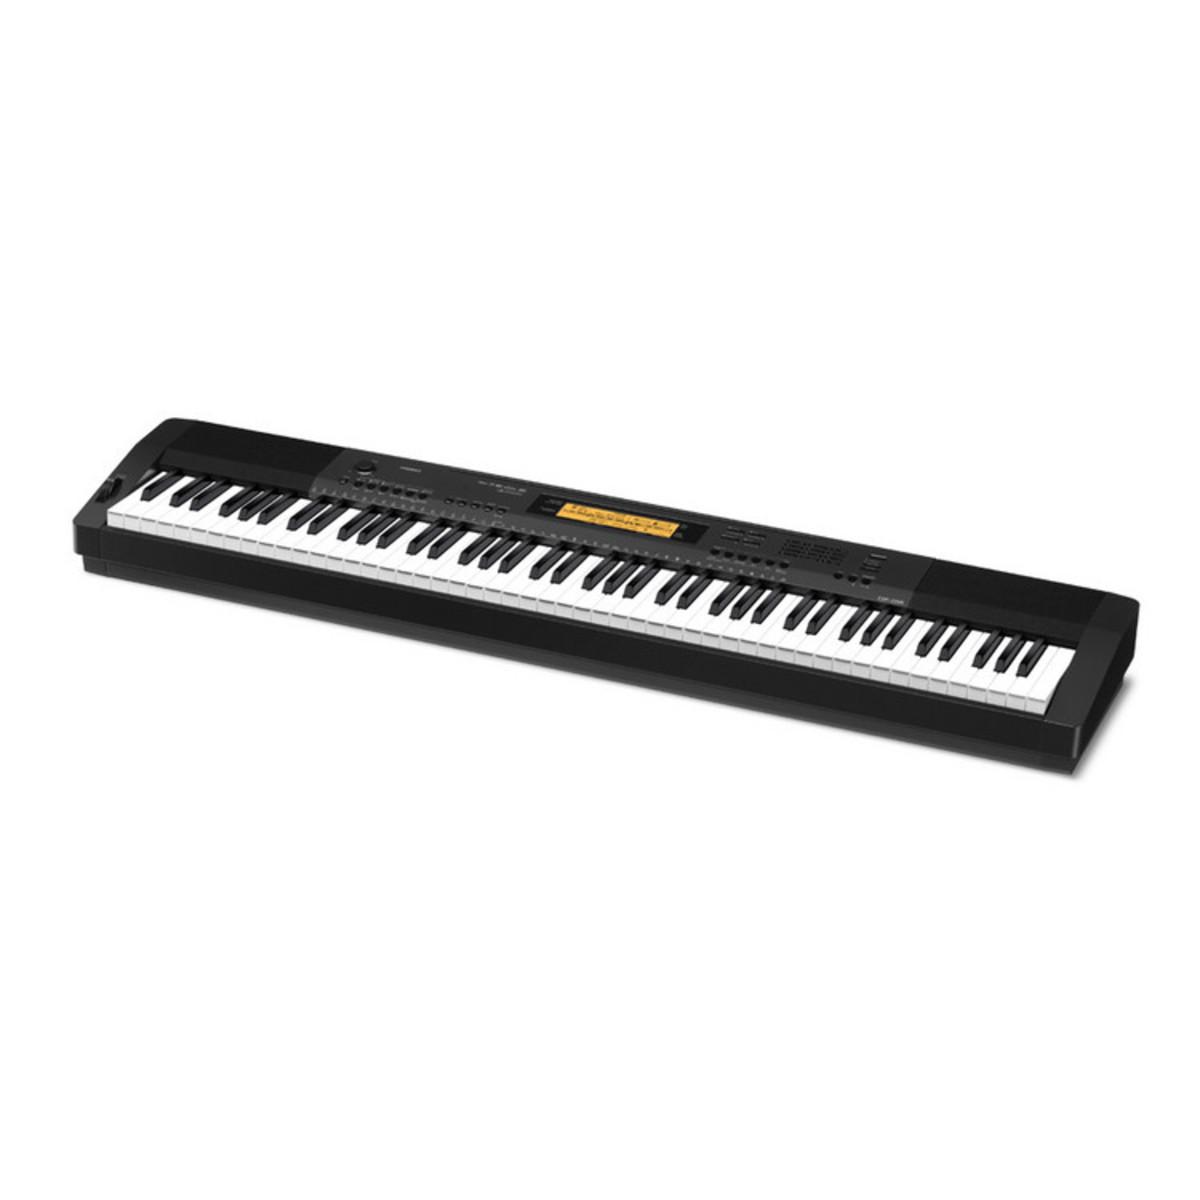 casio cdp 220r digital piano b stock at gear4music. Black Bedroom Furniture Sets. Home Design Ideas